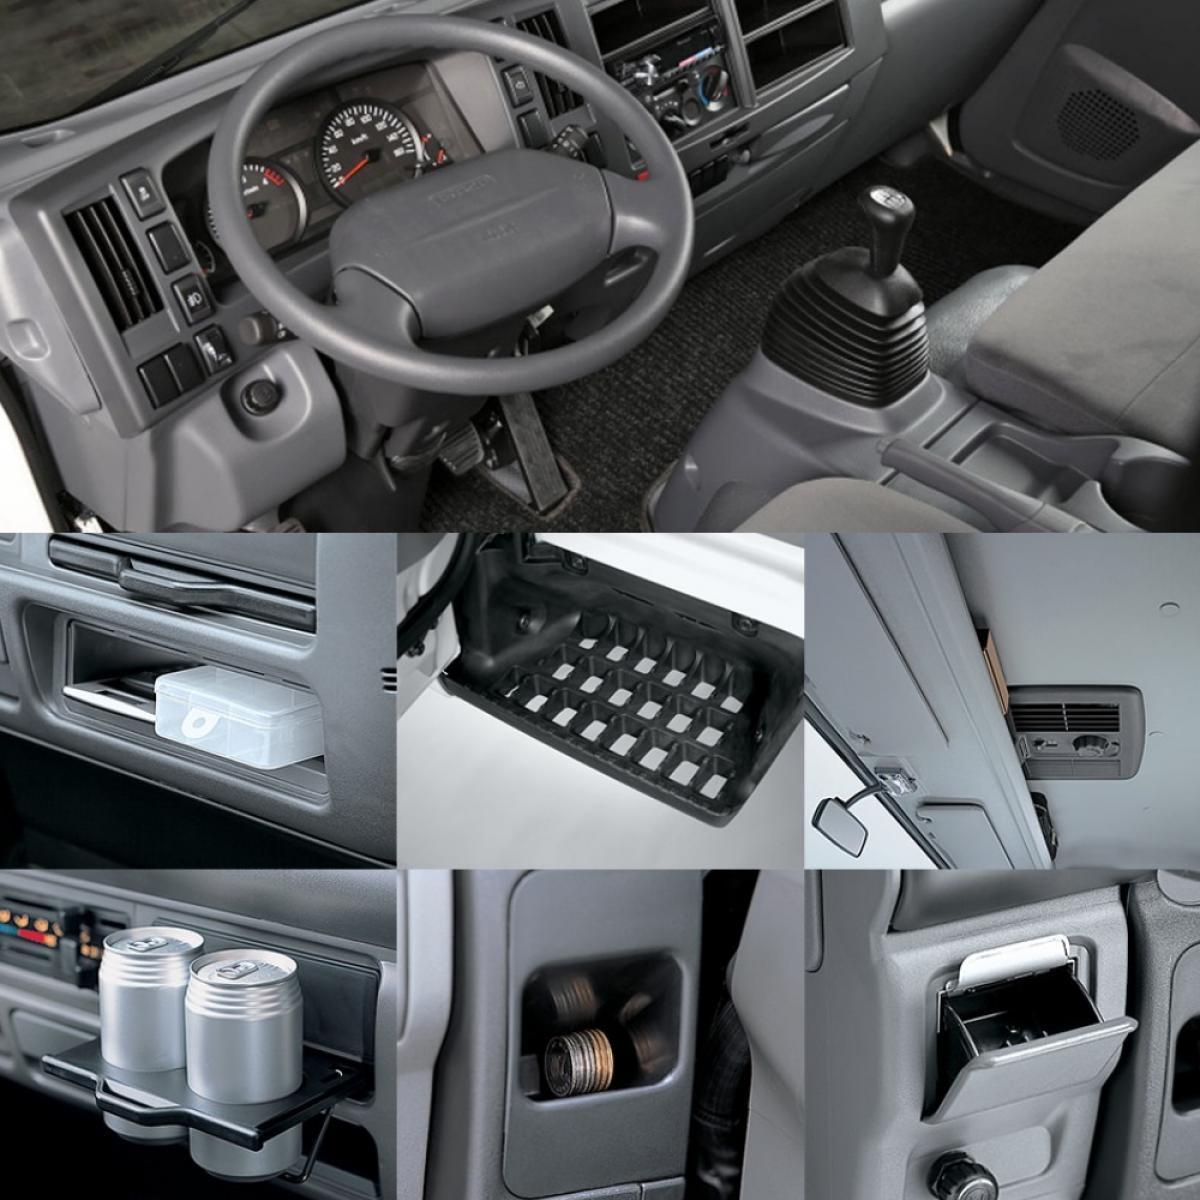 Isuzu P65 Comfort